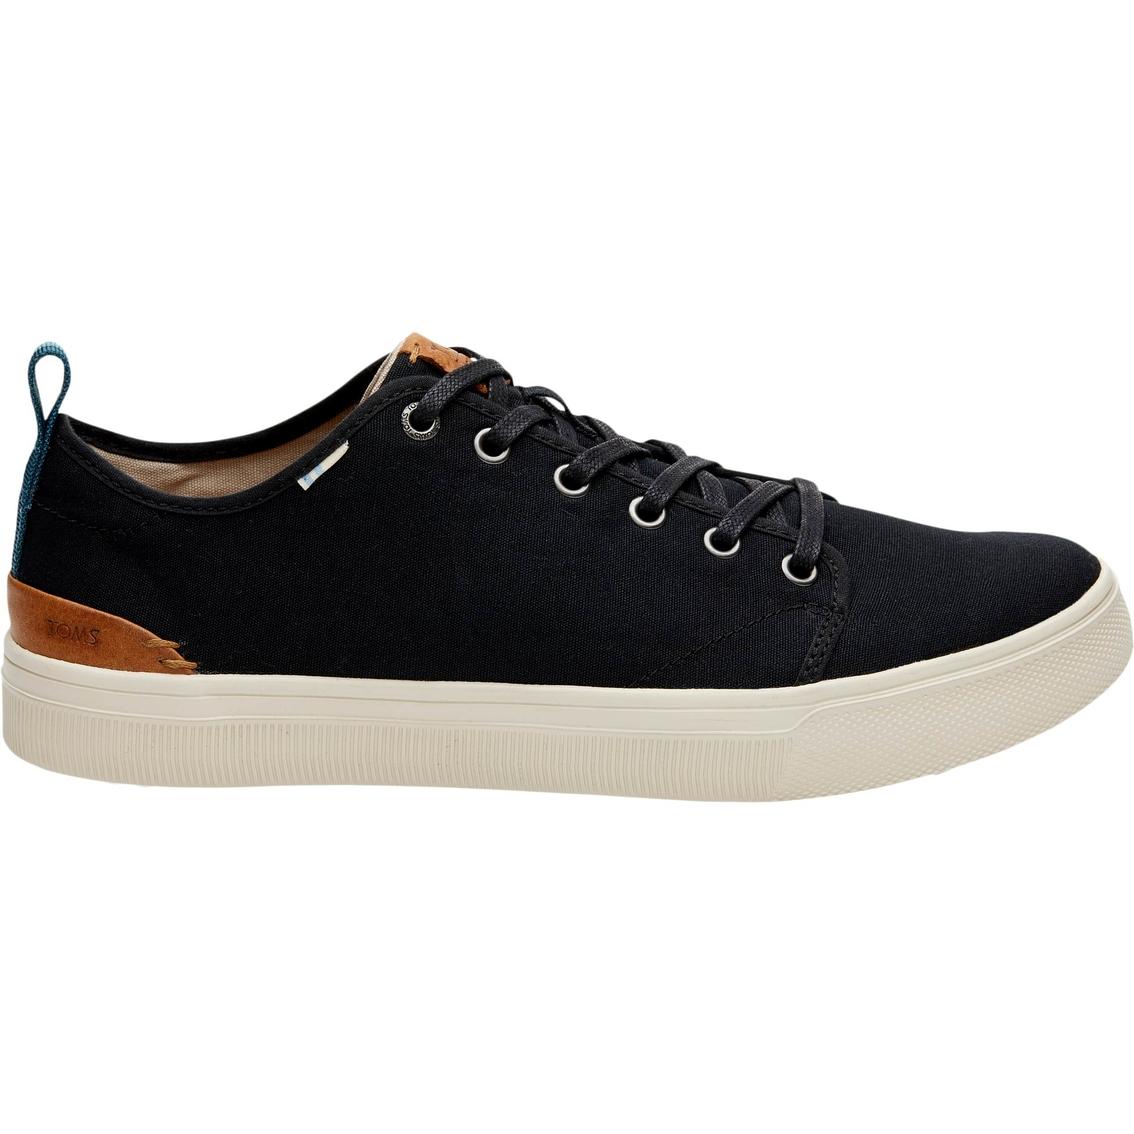 Toms Travel Lite Low Canvas Sneaker